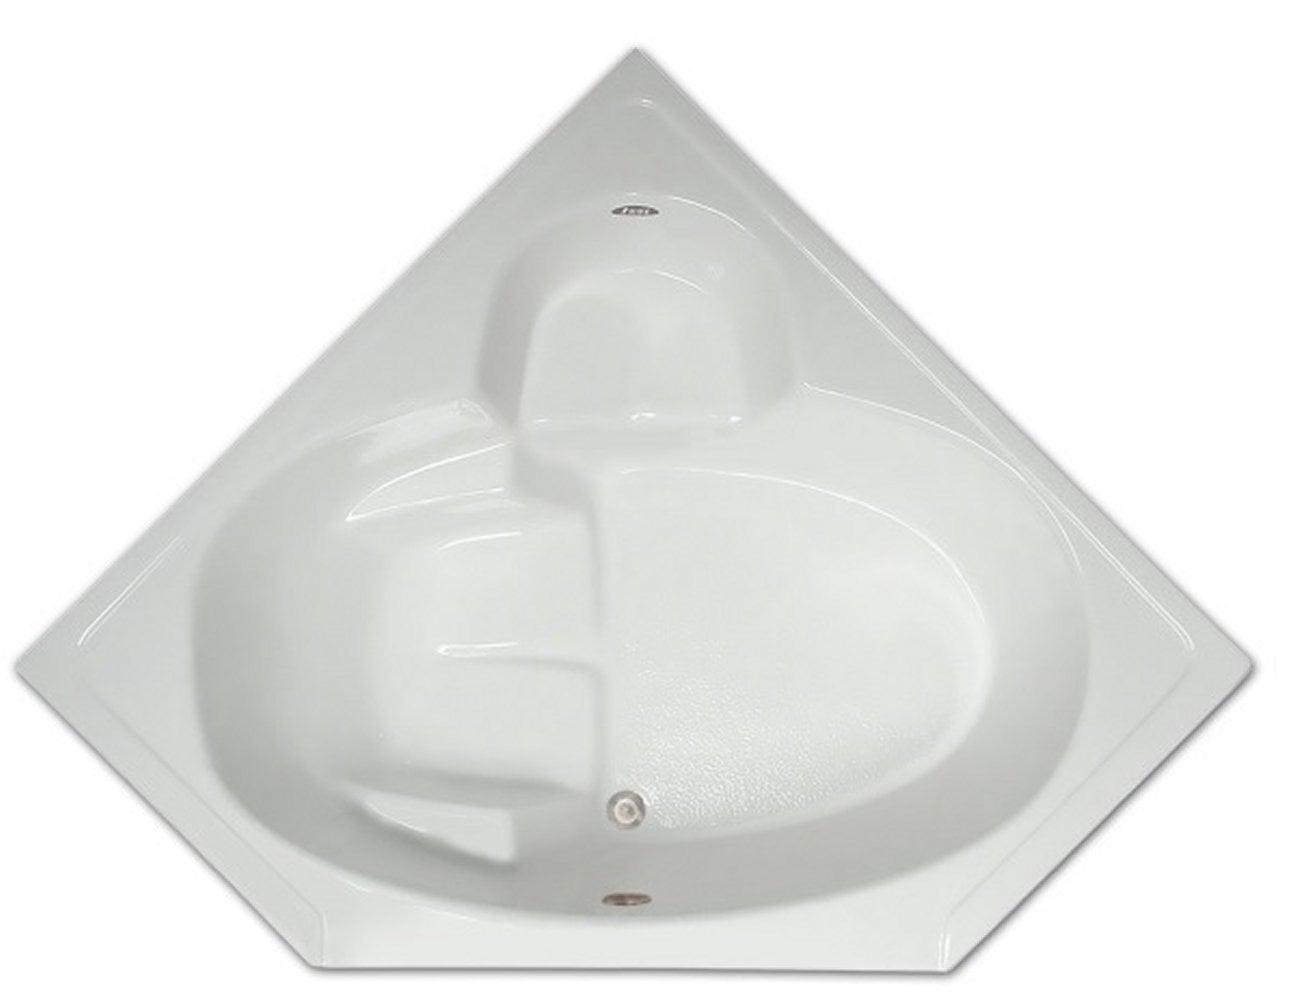 Drop-in Bathtub / 60x31.5x18.5 / high gloss white acrylic / Corner / LPI305-S Pinnacle Bath - Soaker 0